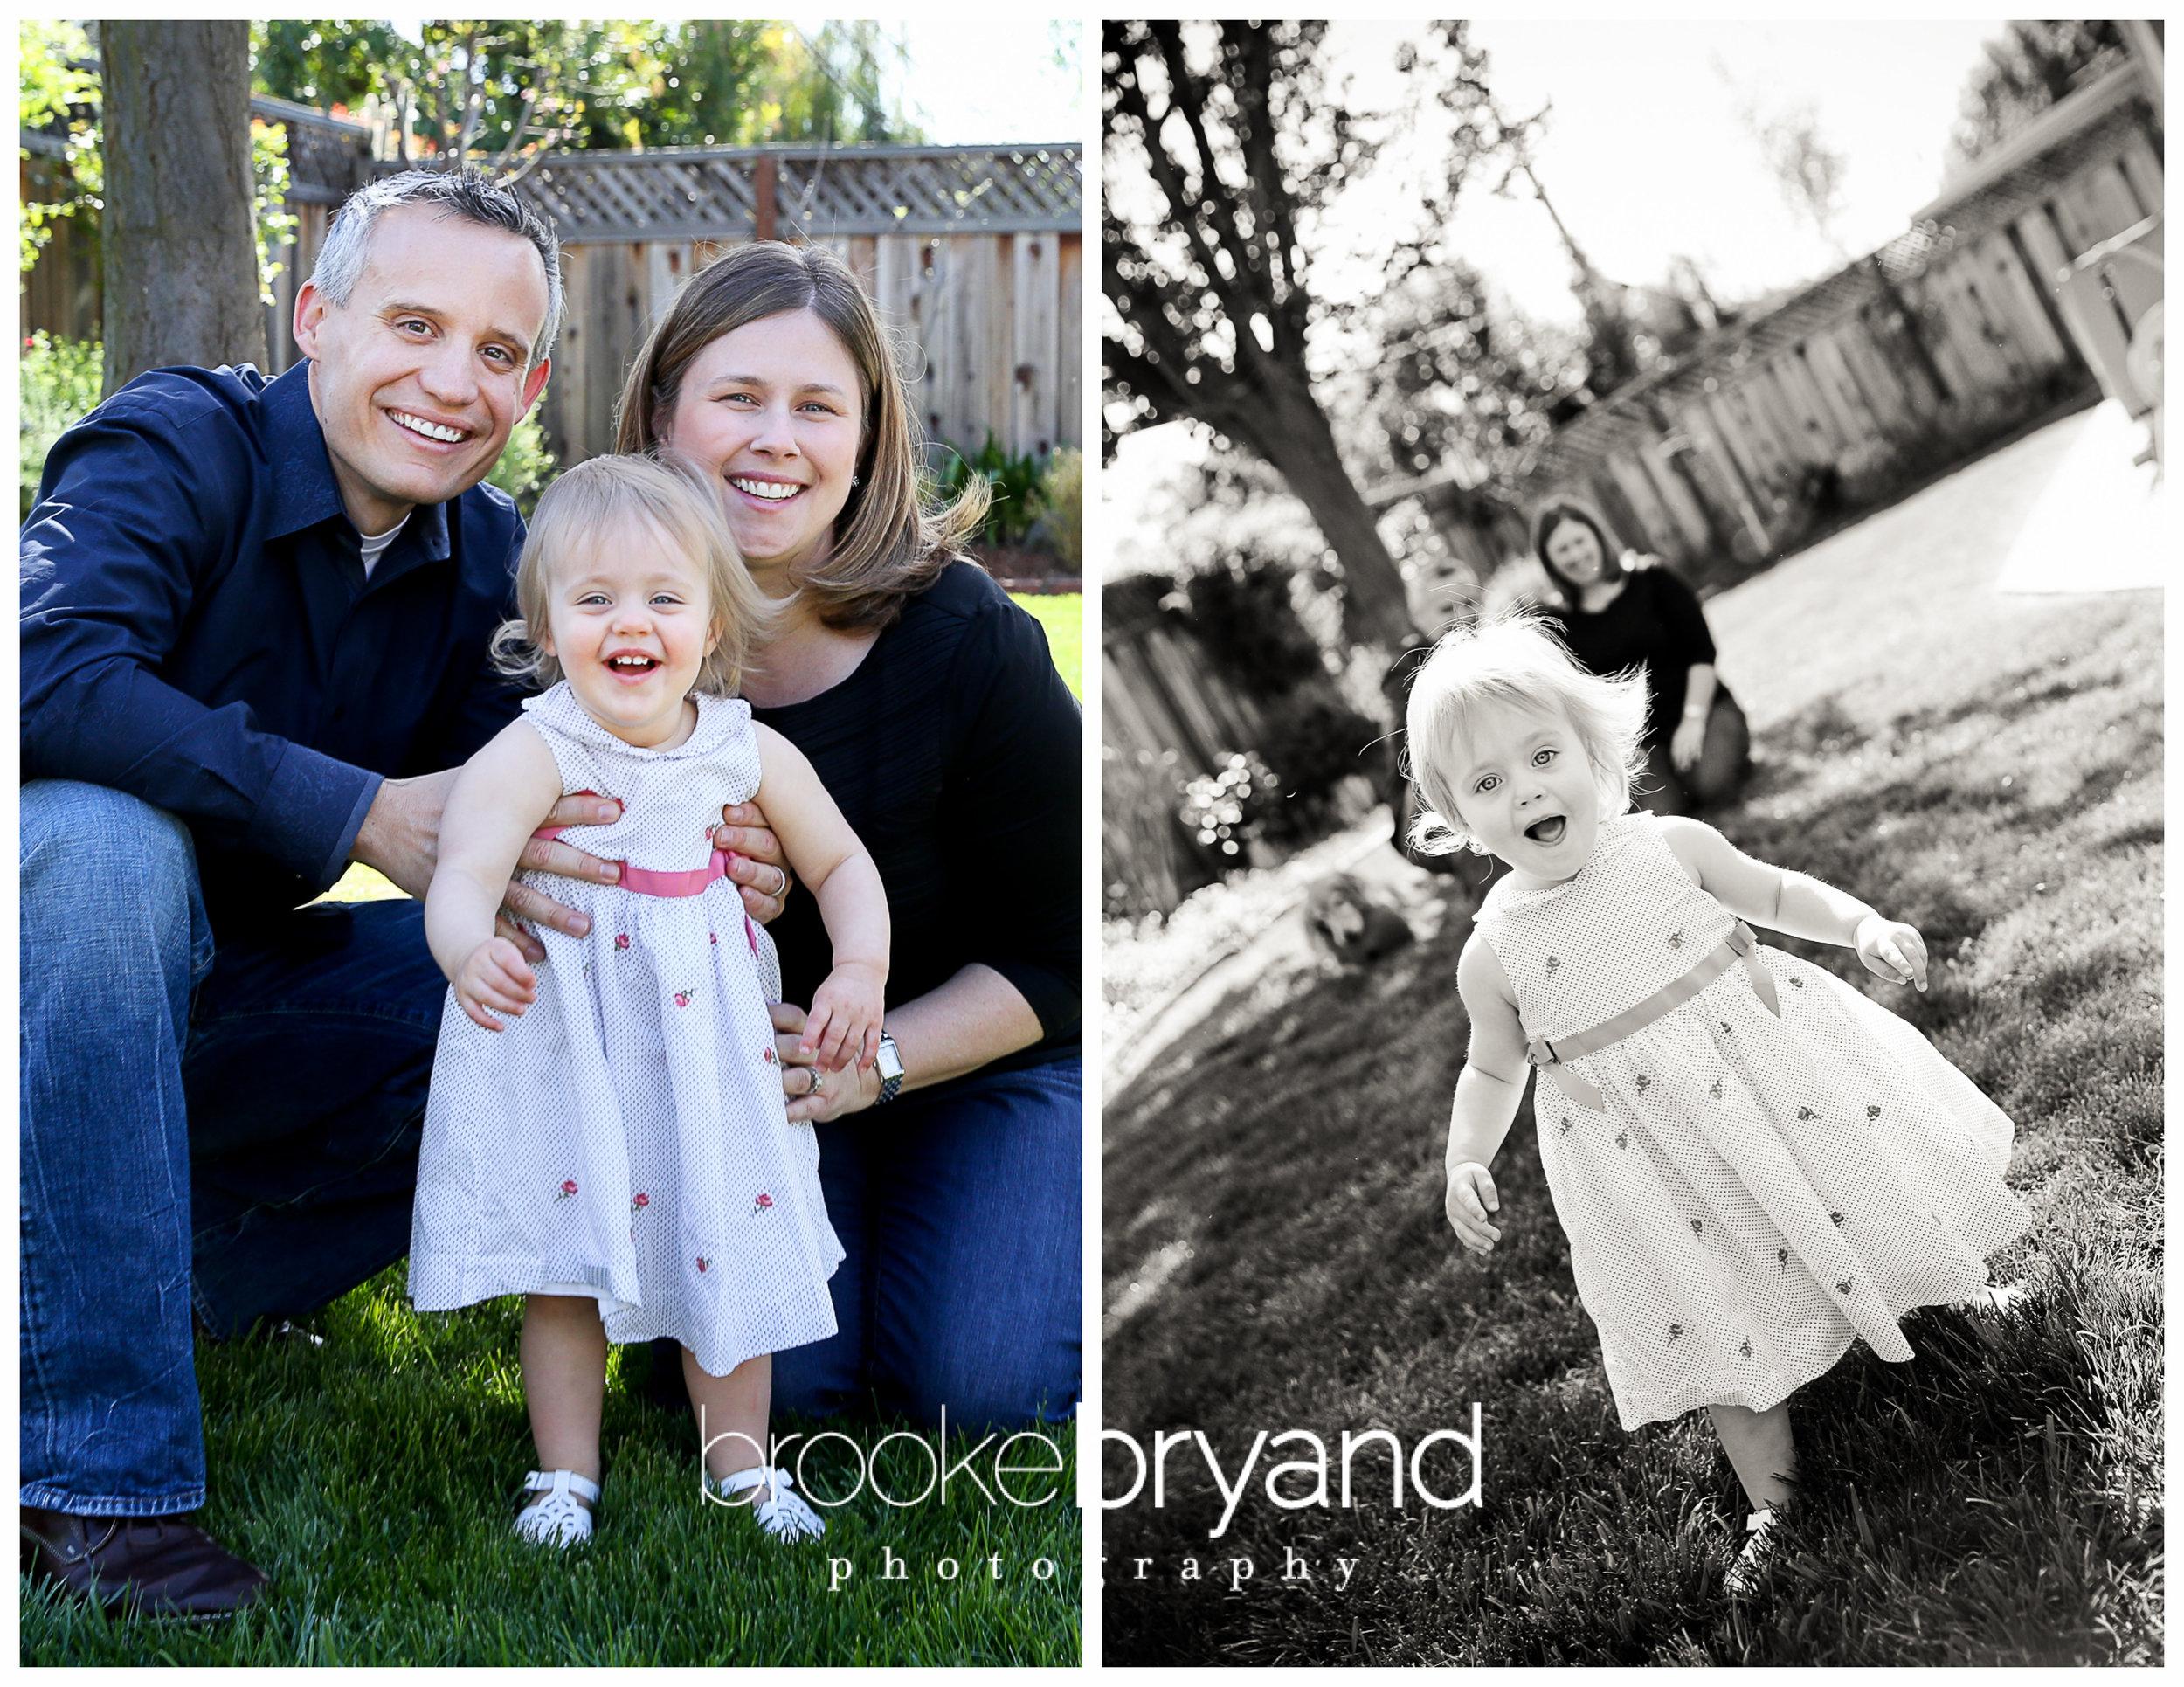 Brooke-Bryand-Photography-San-Francisco-Family-Photographer-2-up-martin-3.jpg